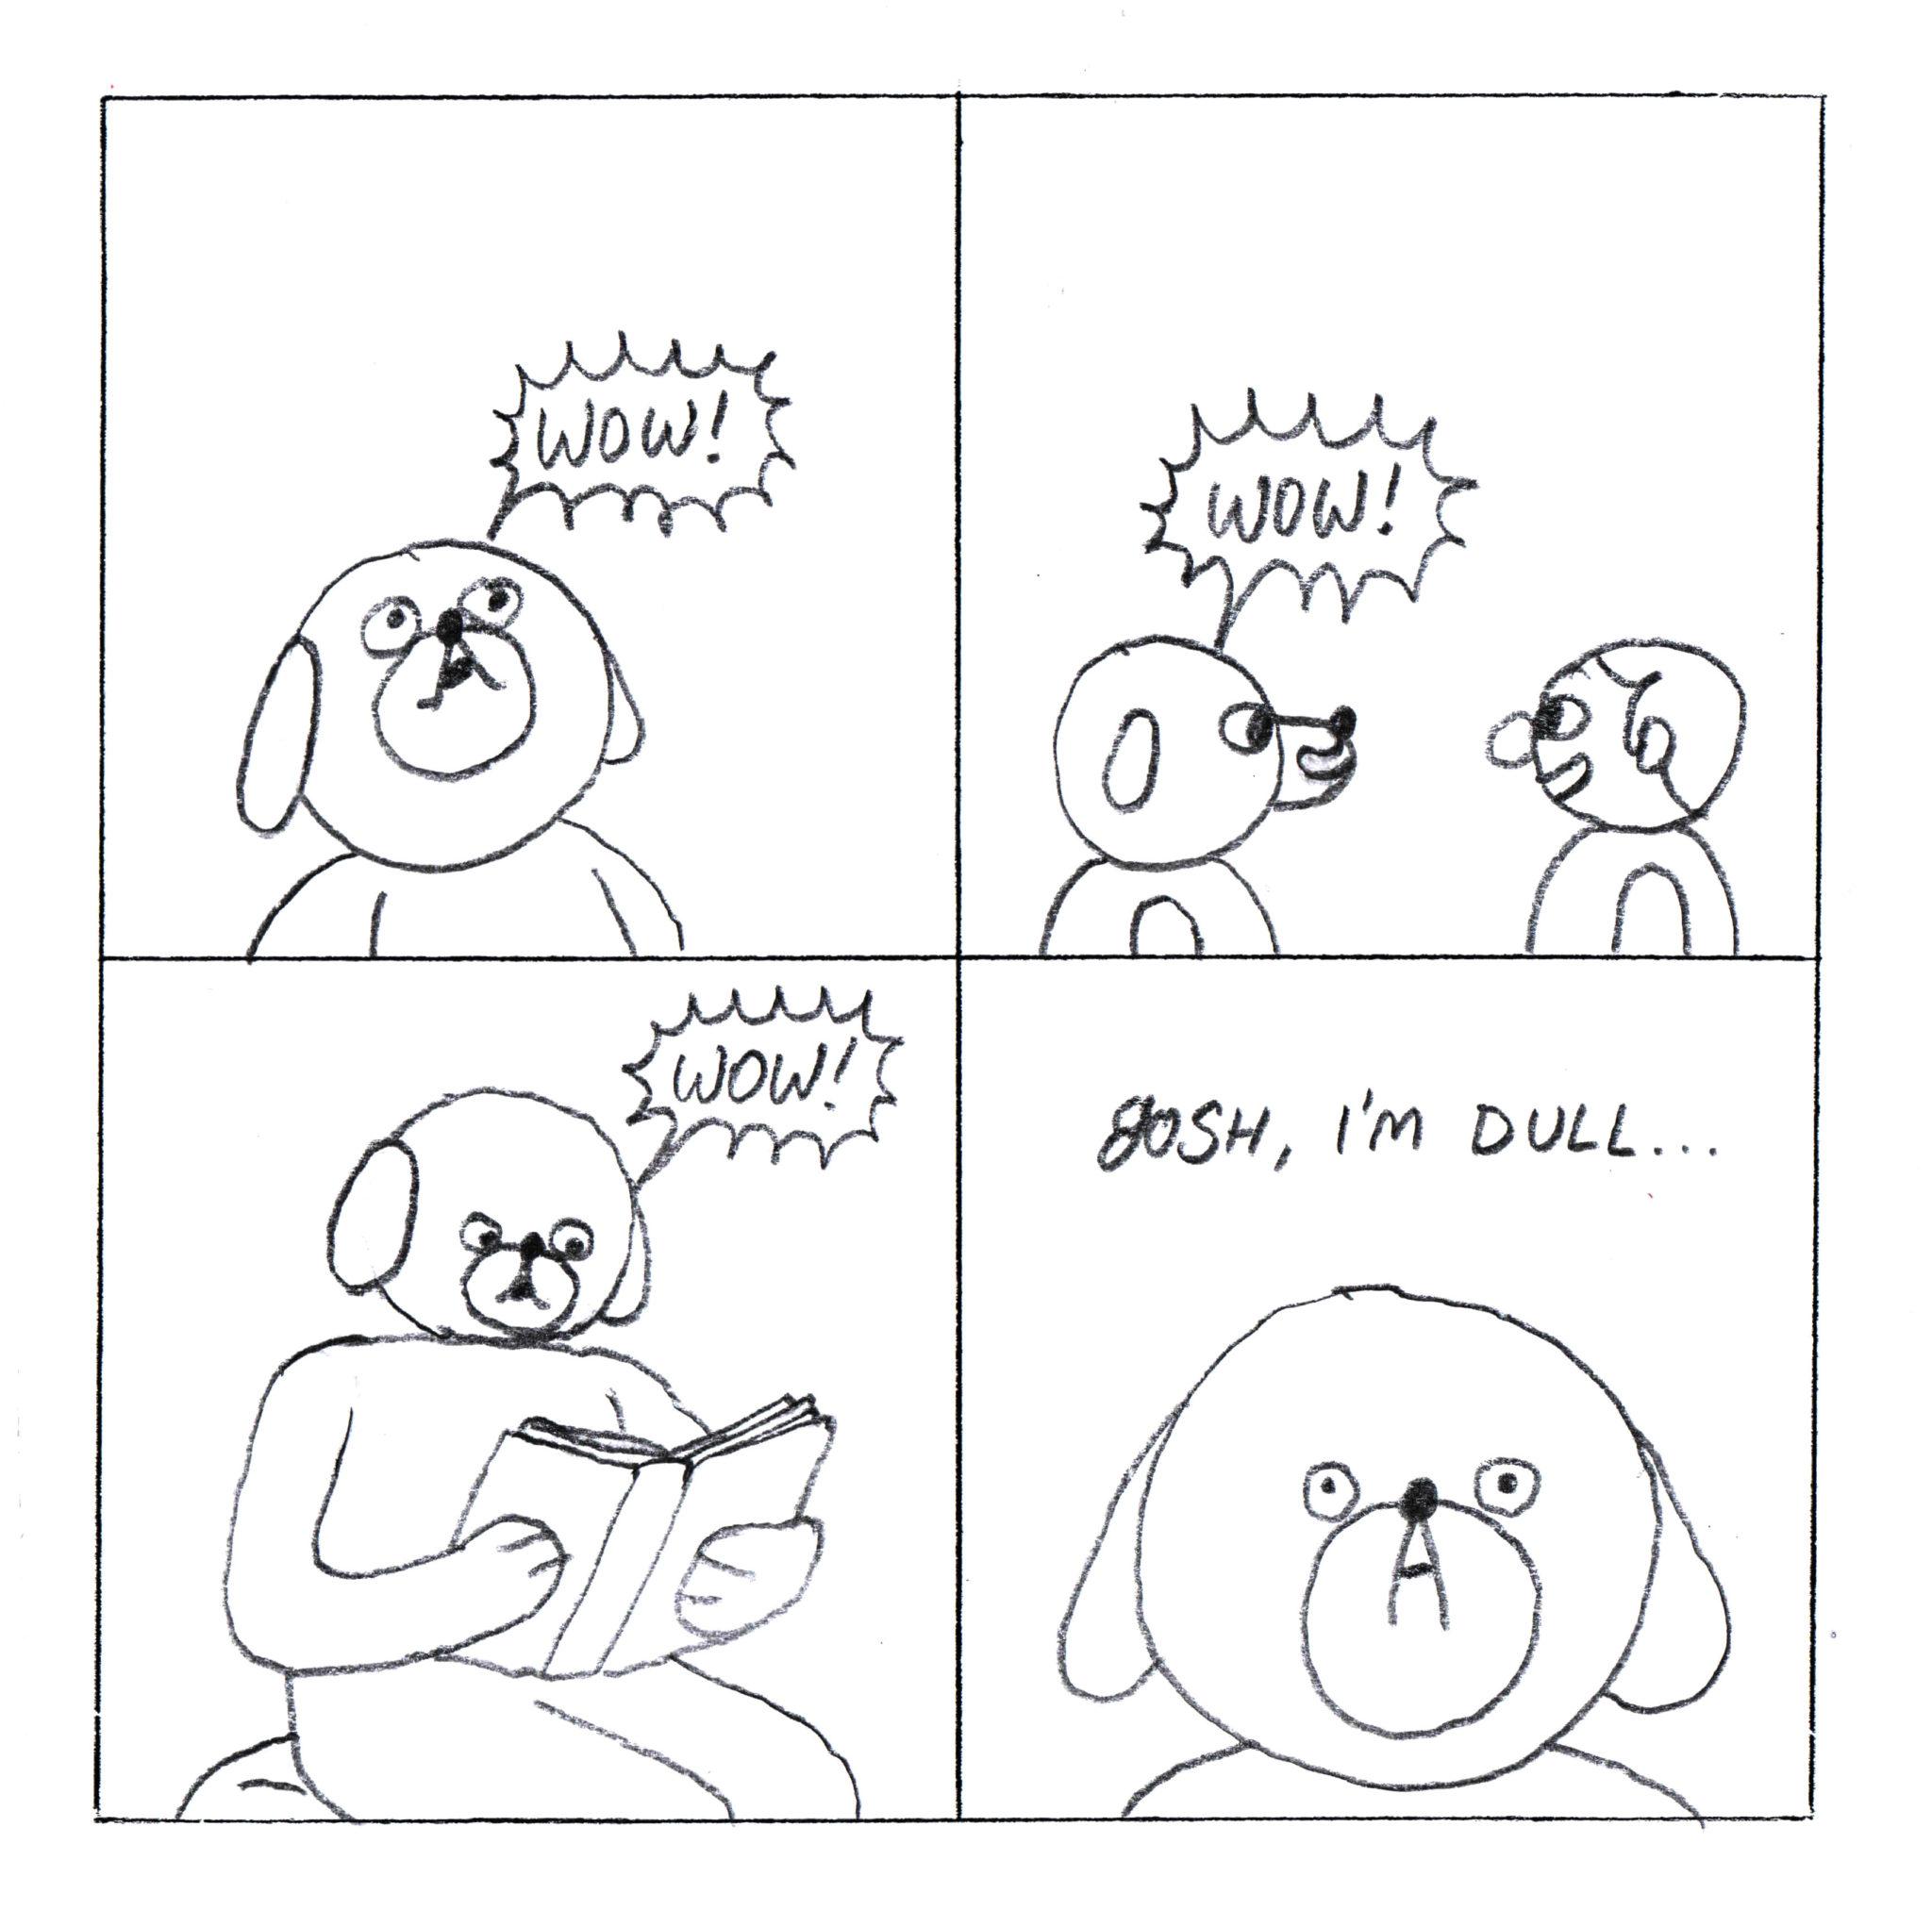 Dog Comics 71-80 - Page 1